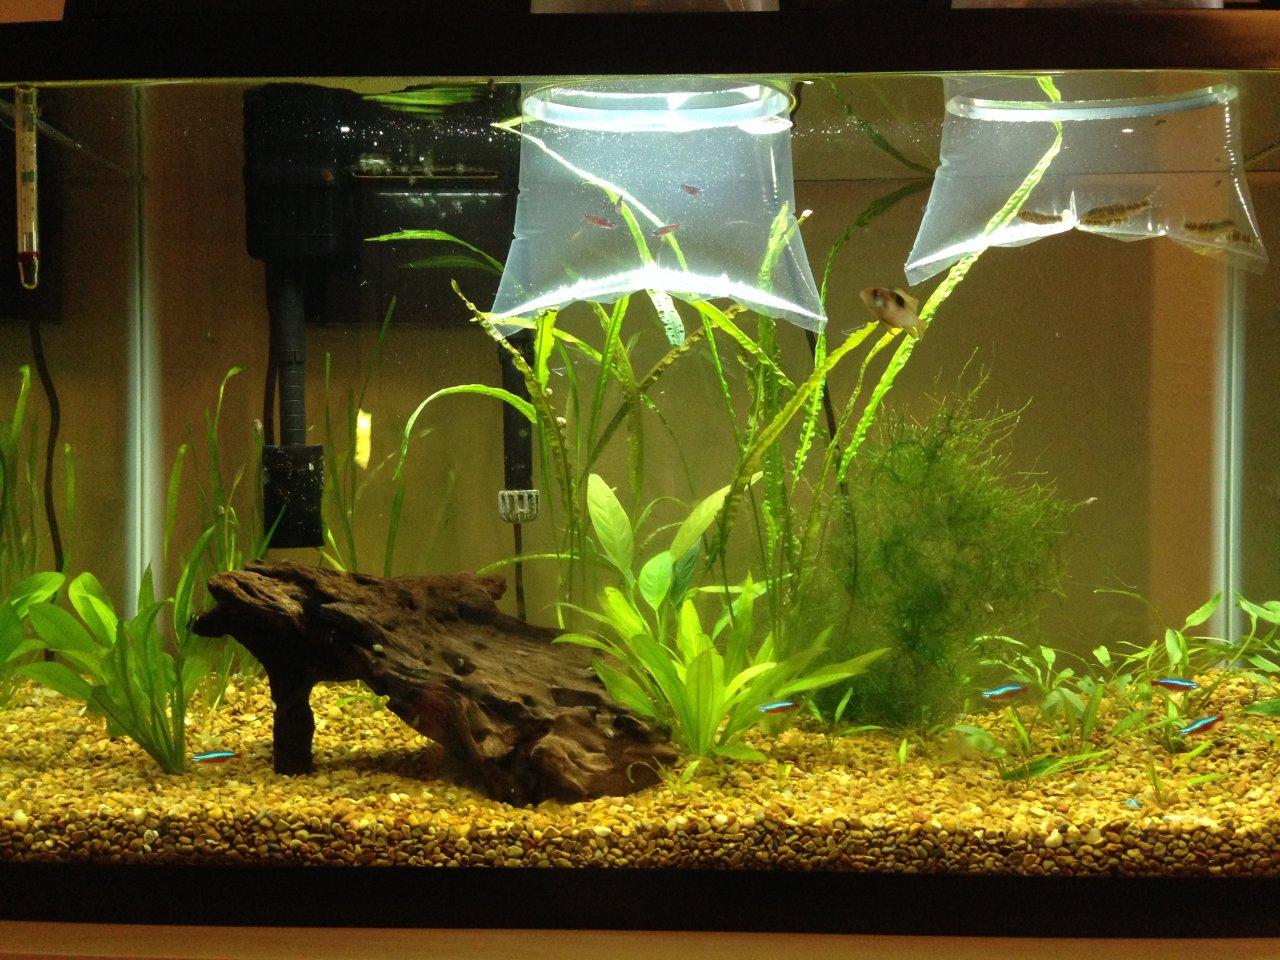 30 Gallon Community Tank My Aquarium Club